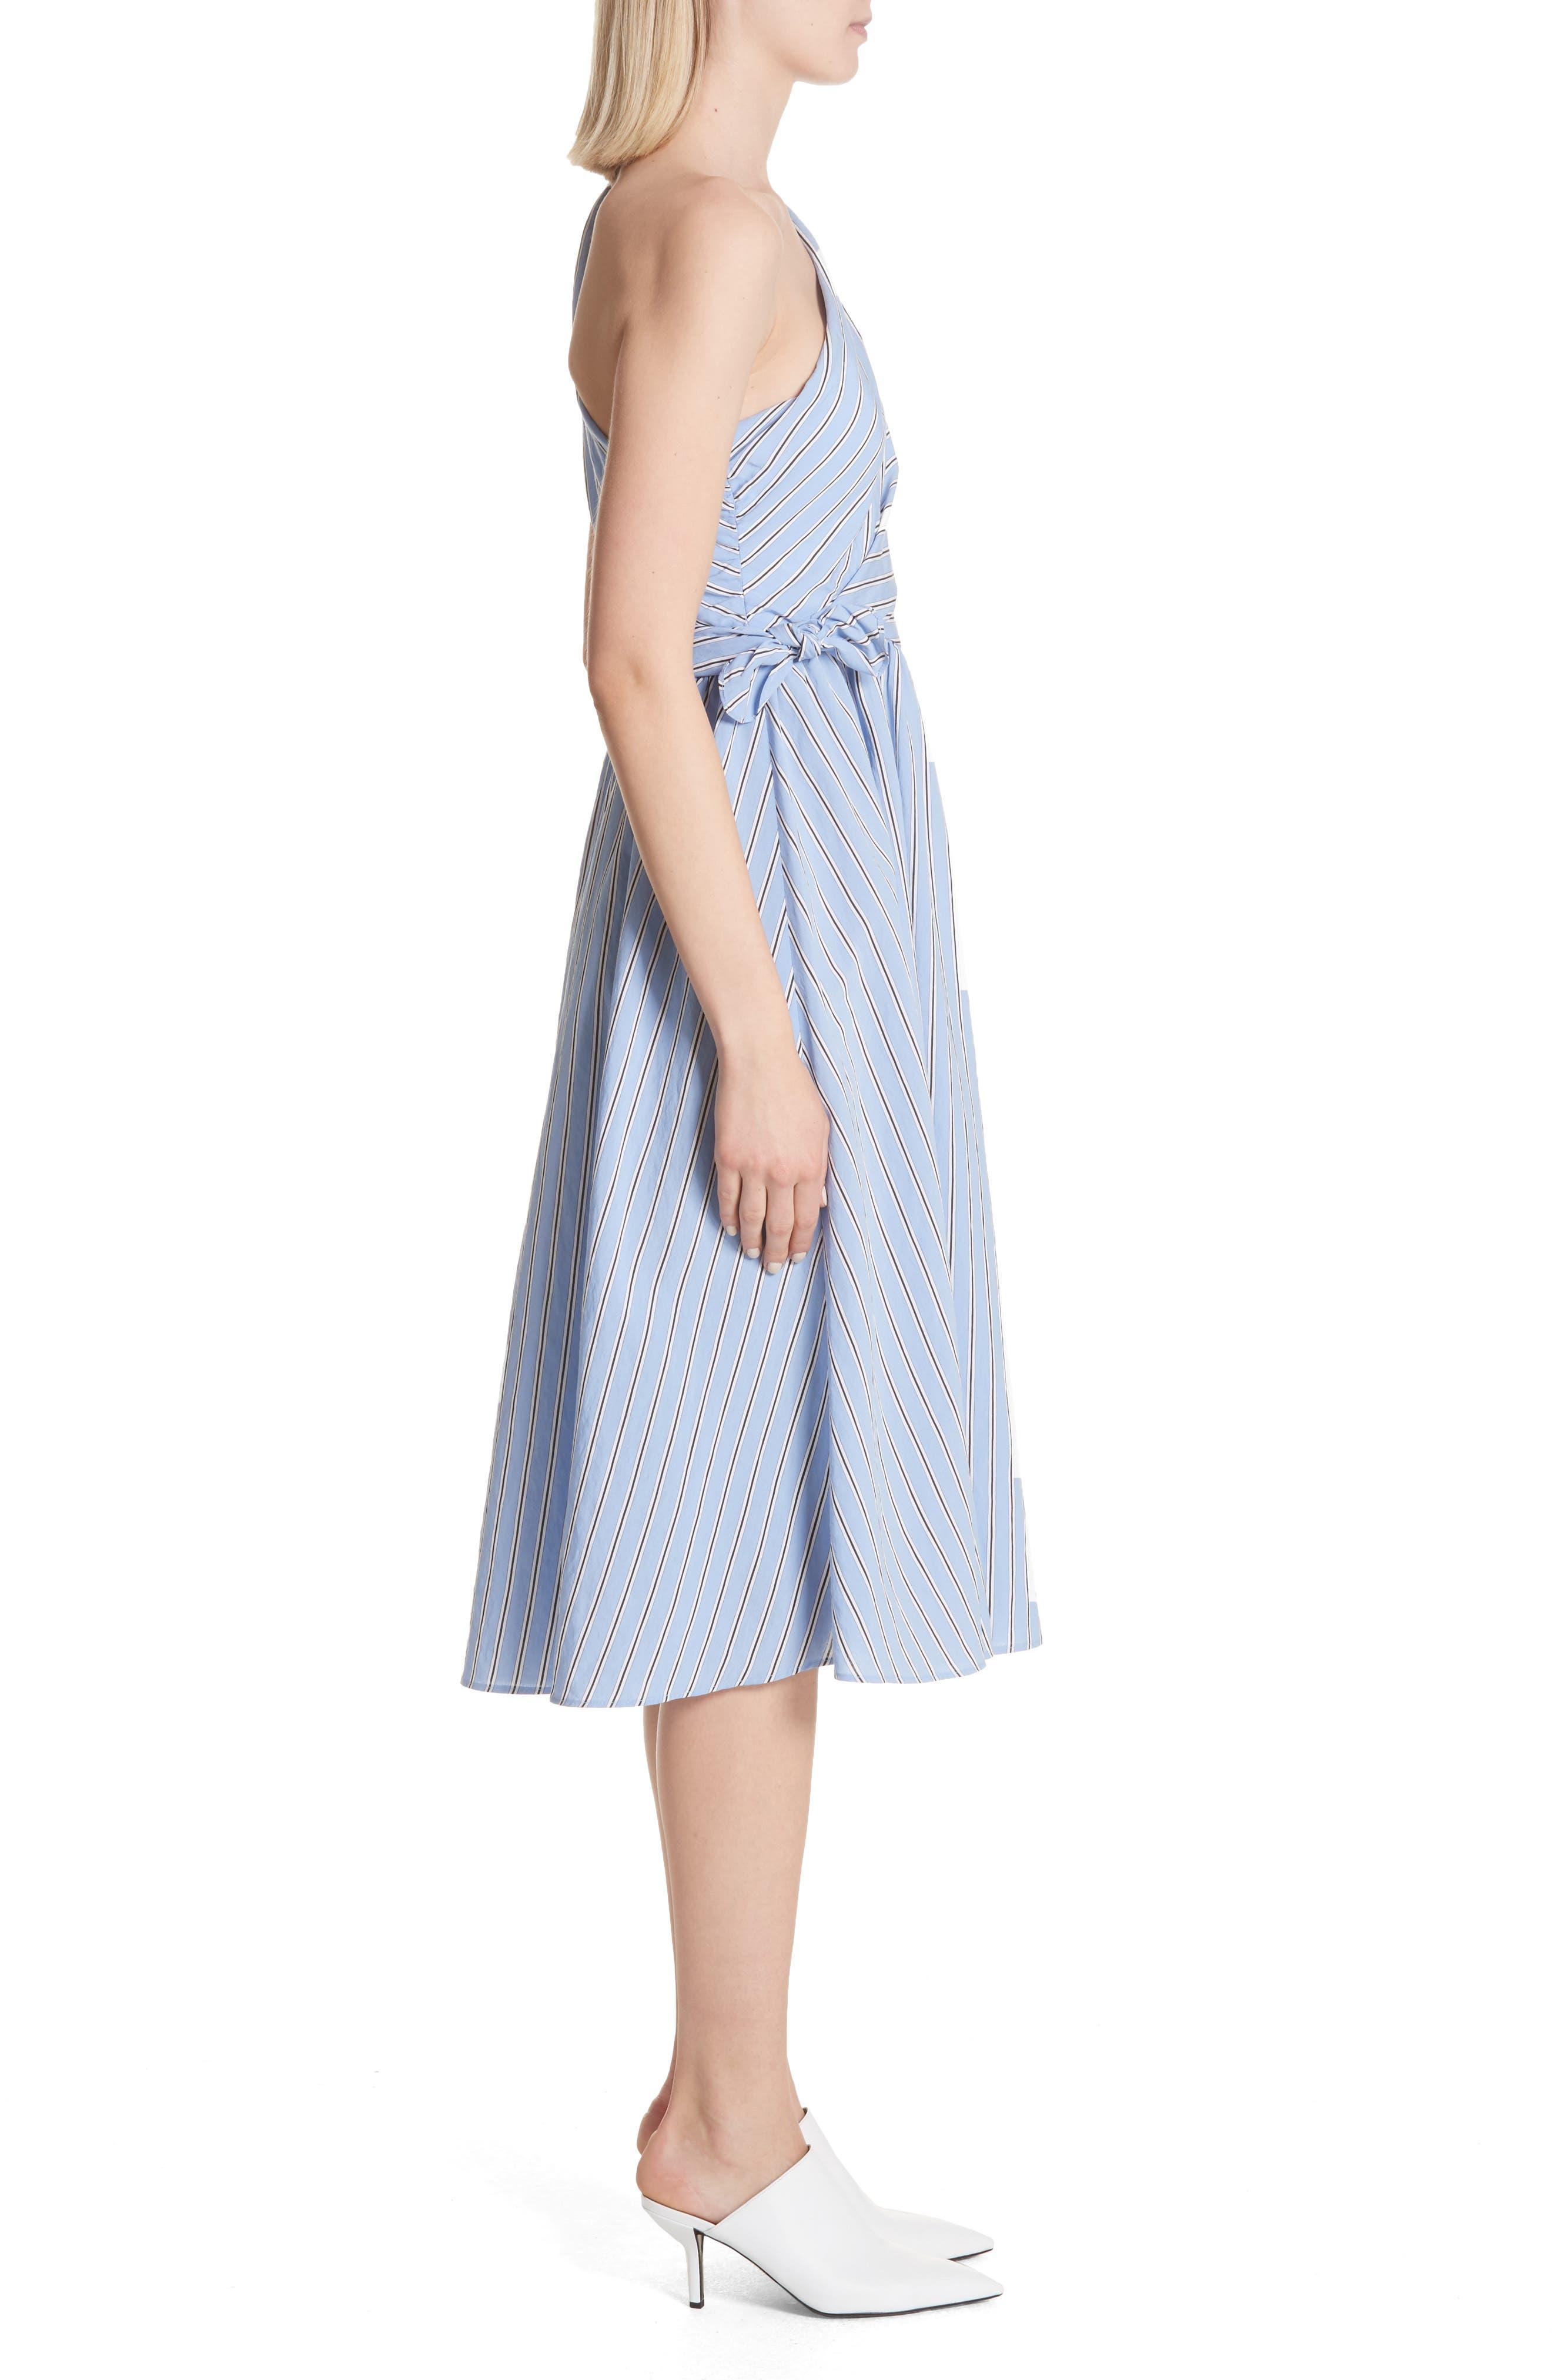 Cabrera Stripe One-Shoulder Dress,                             Alternate thumbnail 3, color,                             420